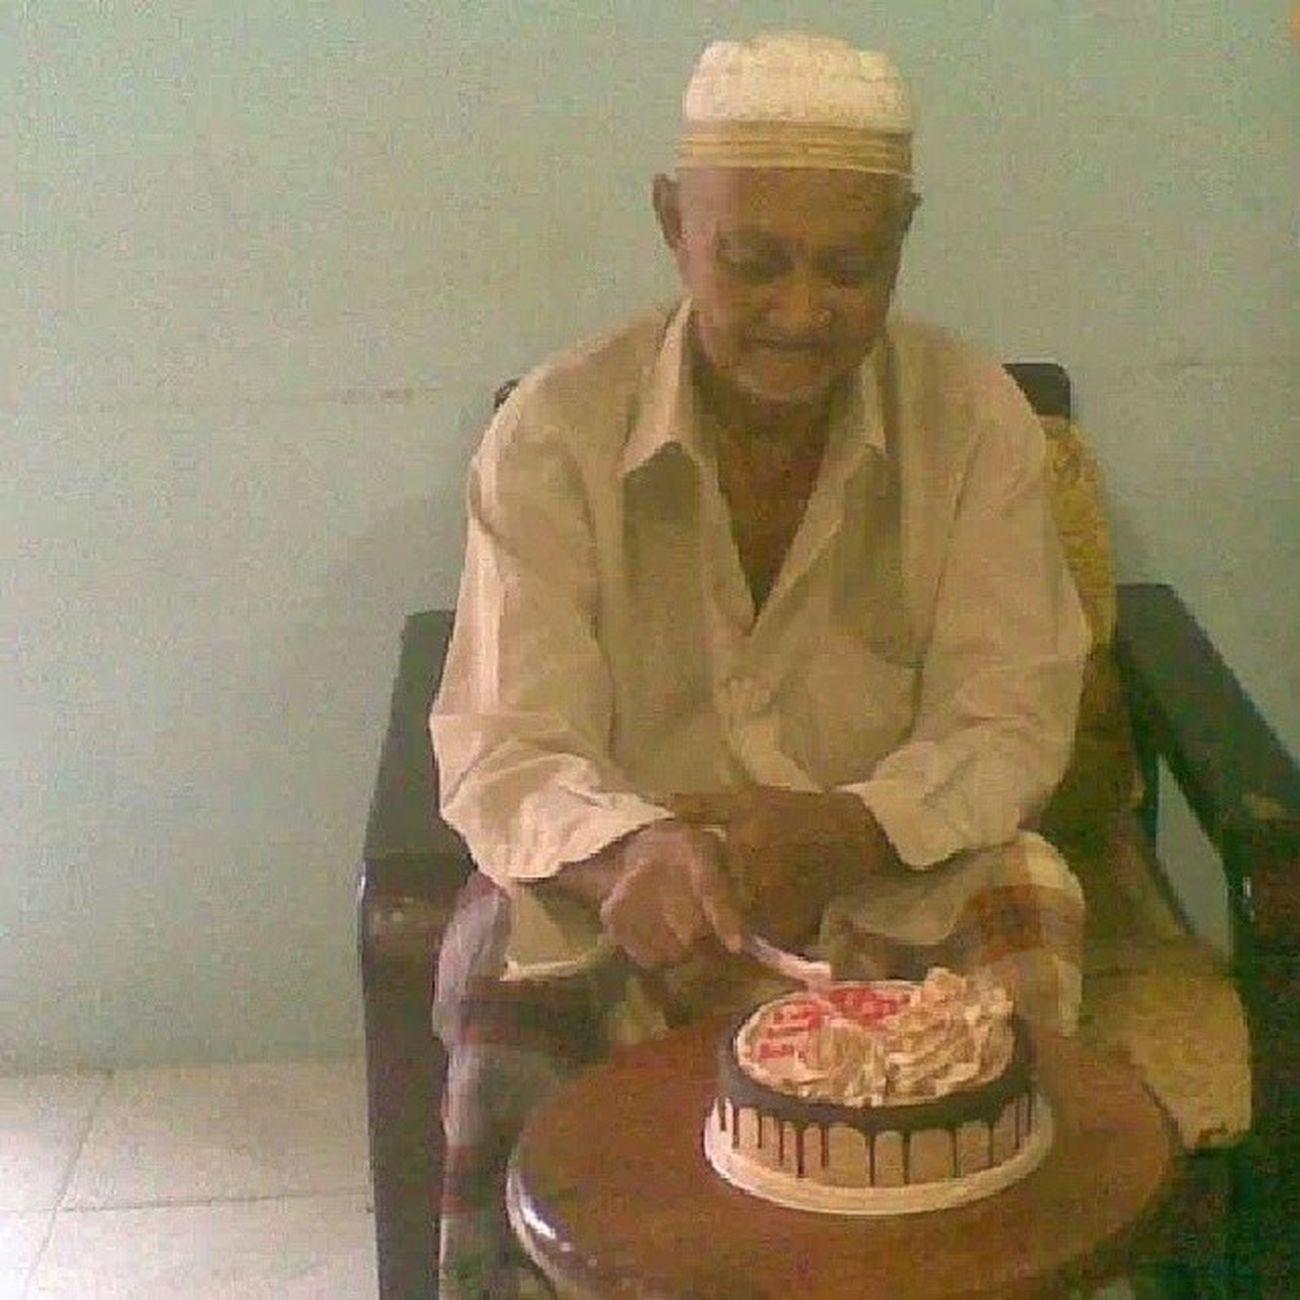 25/1/2014. Genap 3 tahun nenek meninggal kan kami semua. Banyak kenangan bersama tidak aku dapat lupakan. Aku rindu kita nenek. Sangat merindui. Al-fatihah to late grandpa and grandma. I miss you!!!! 25 /01/2011